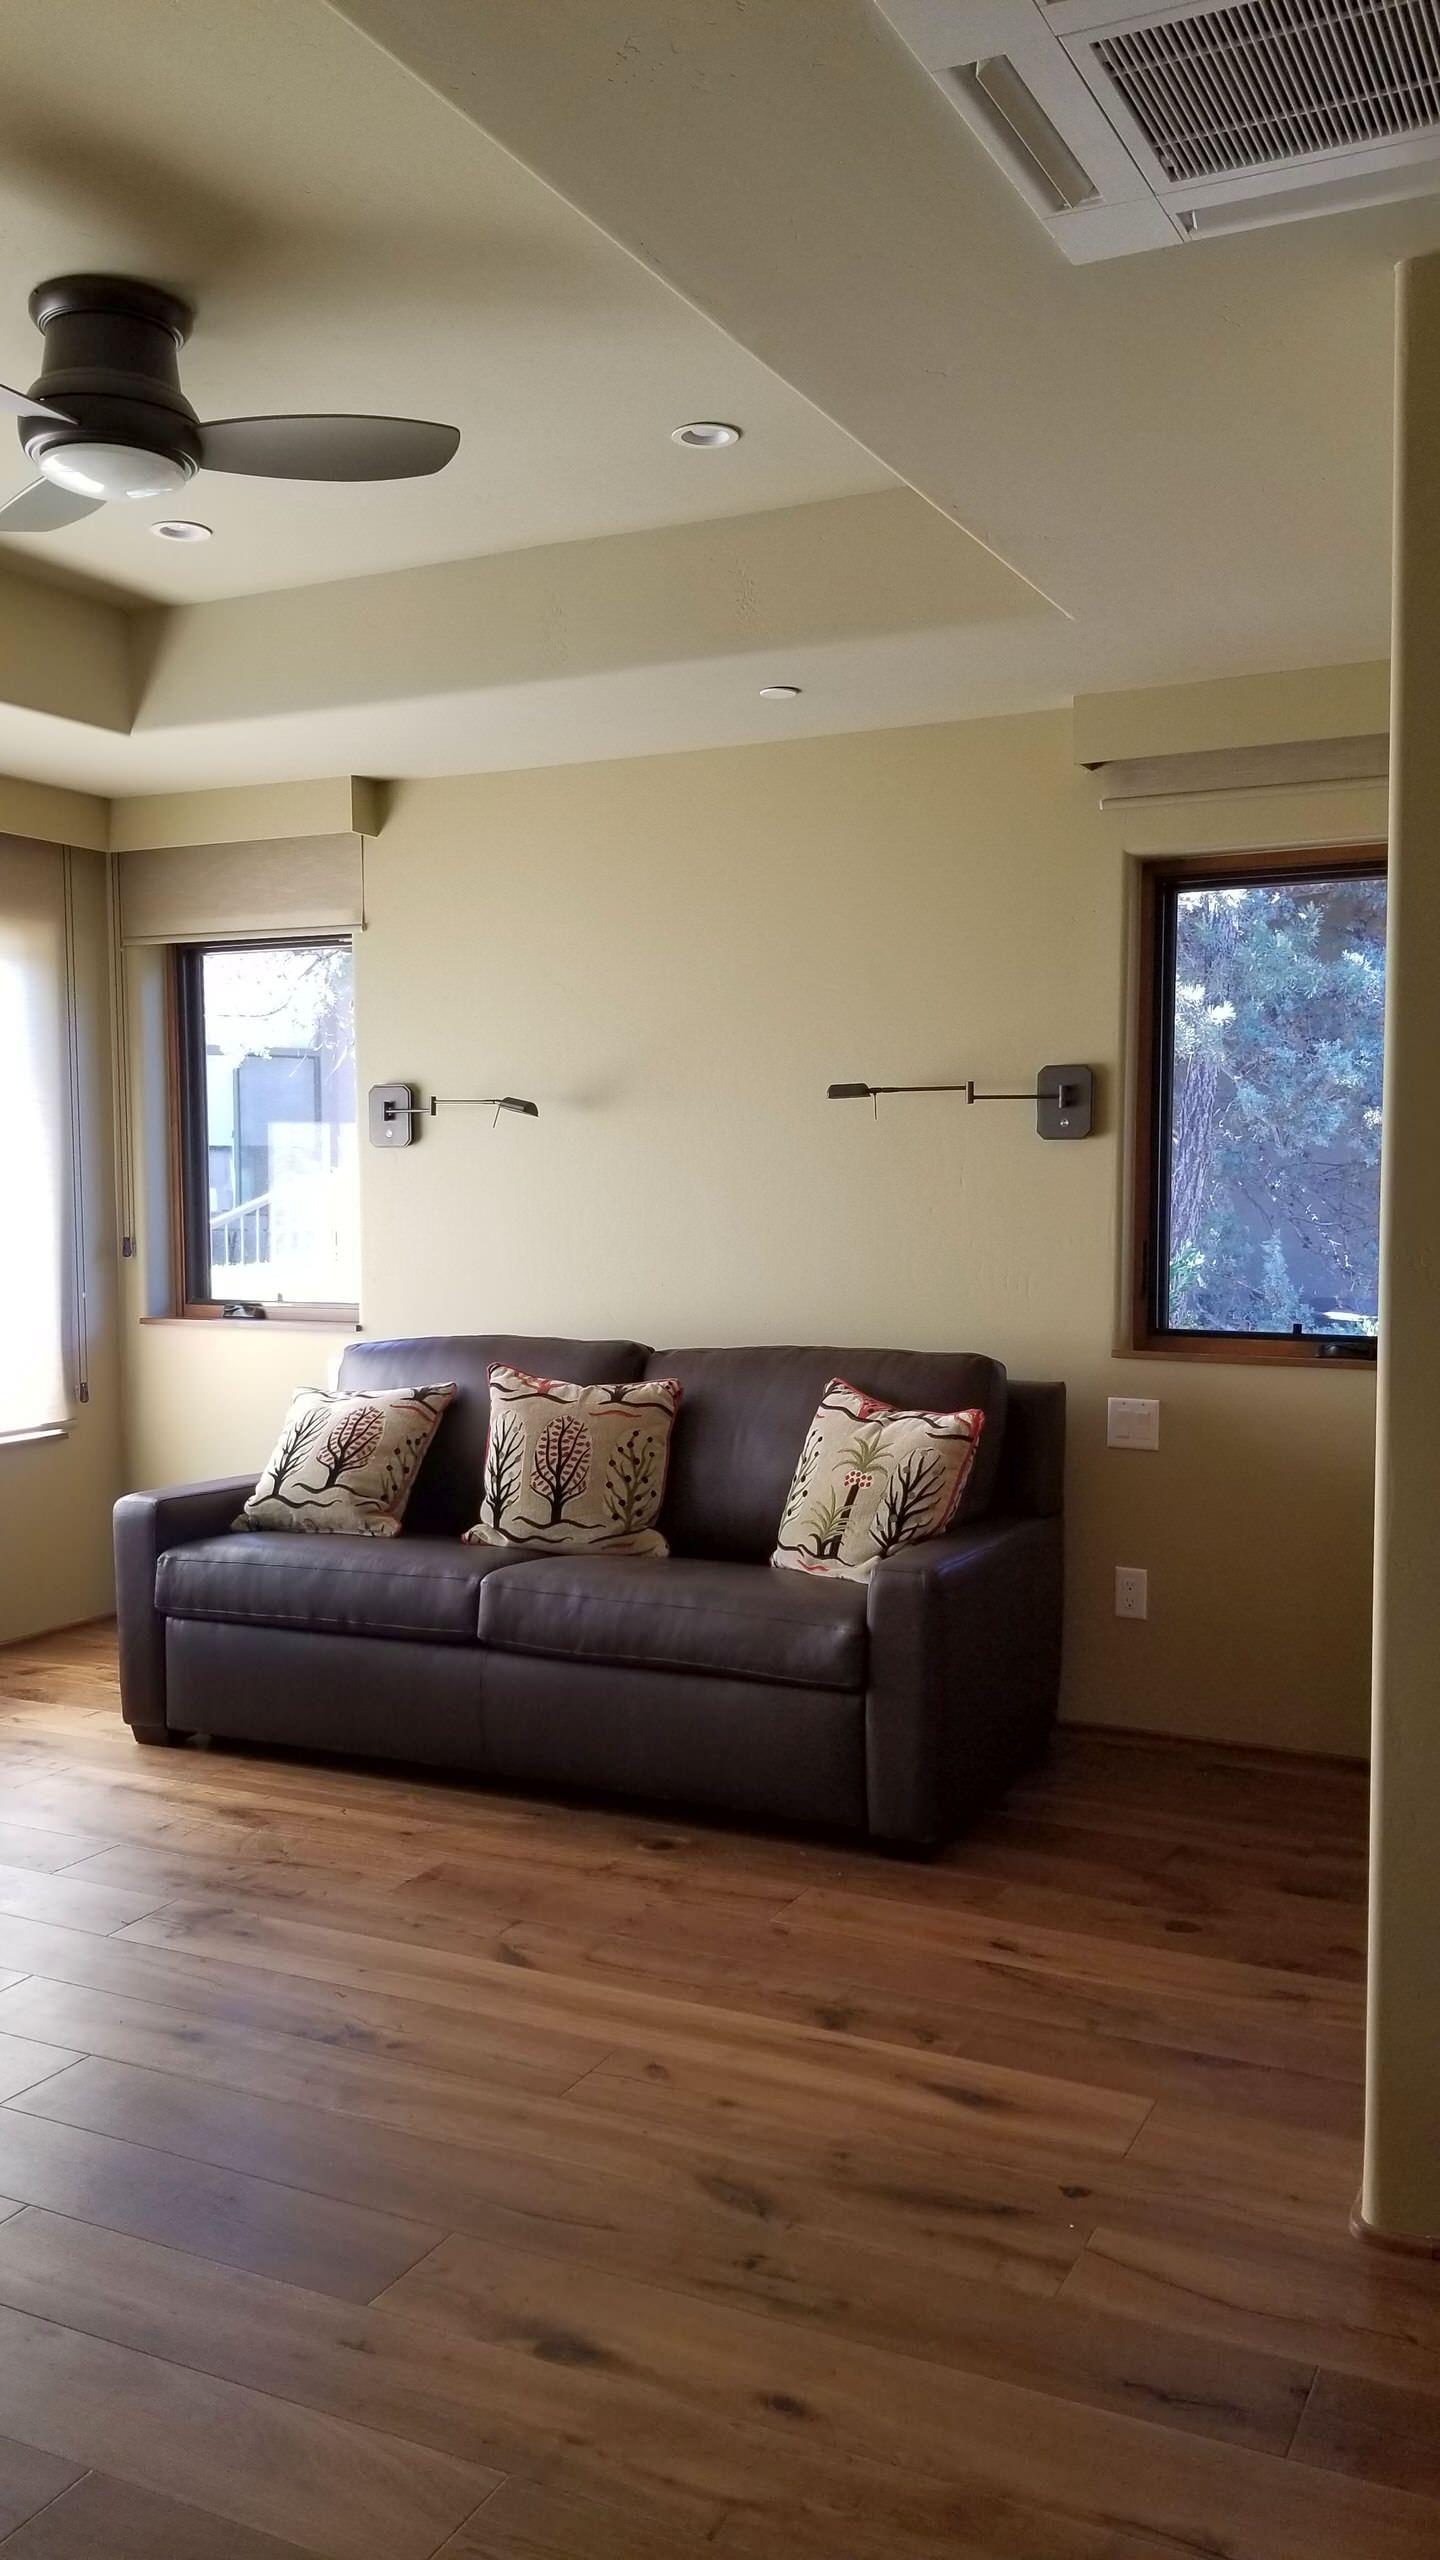 Sedona guest house